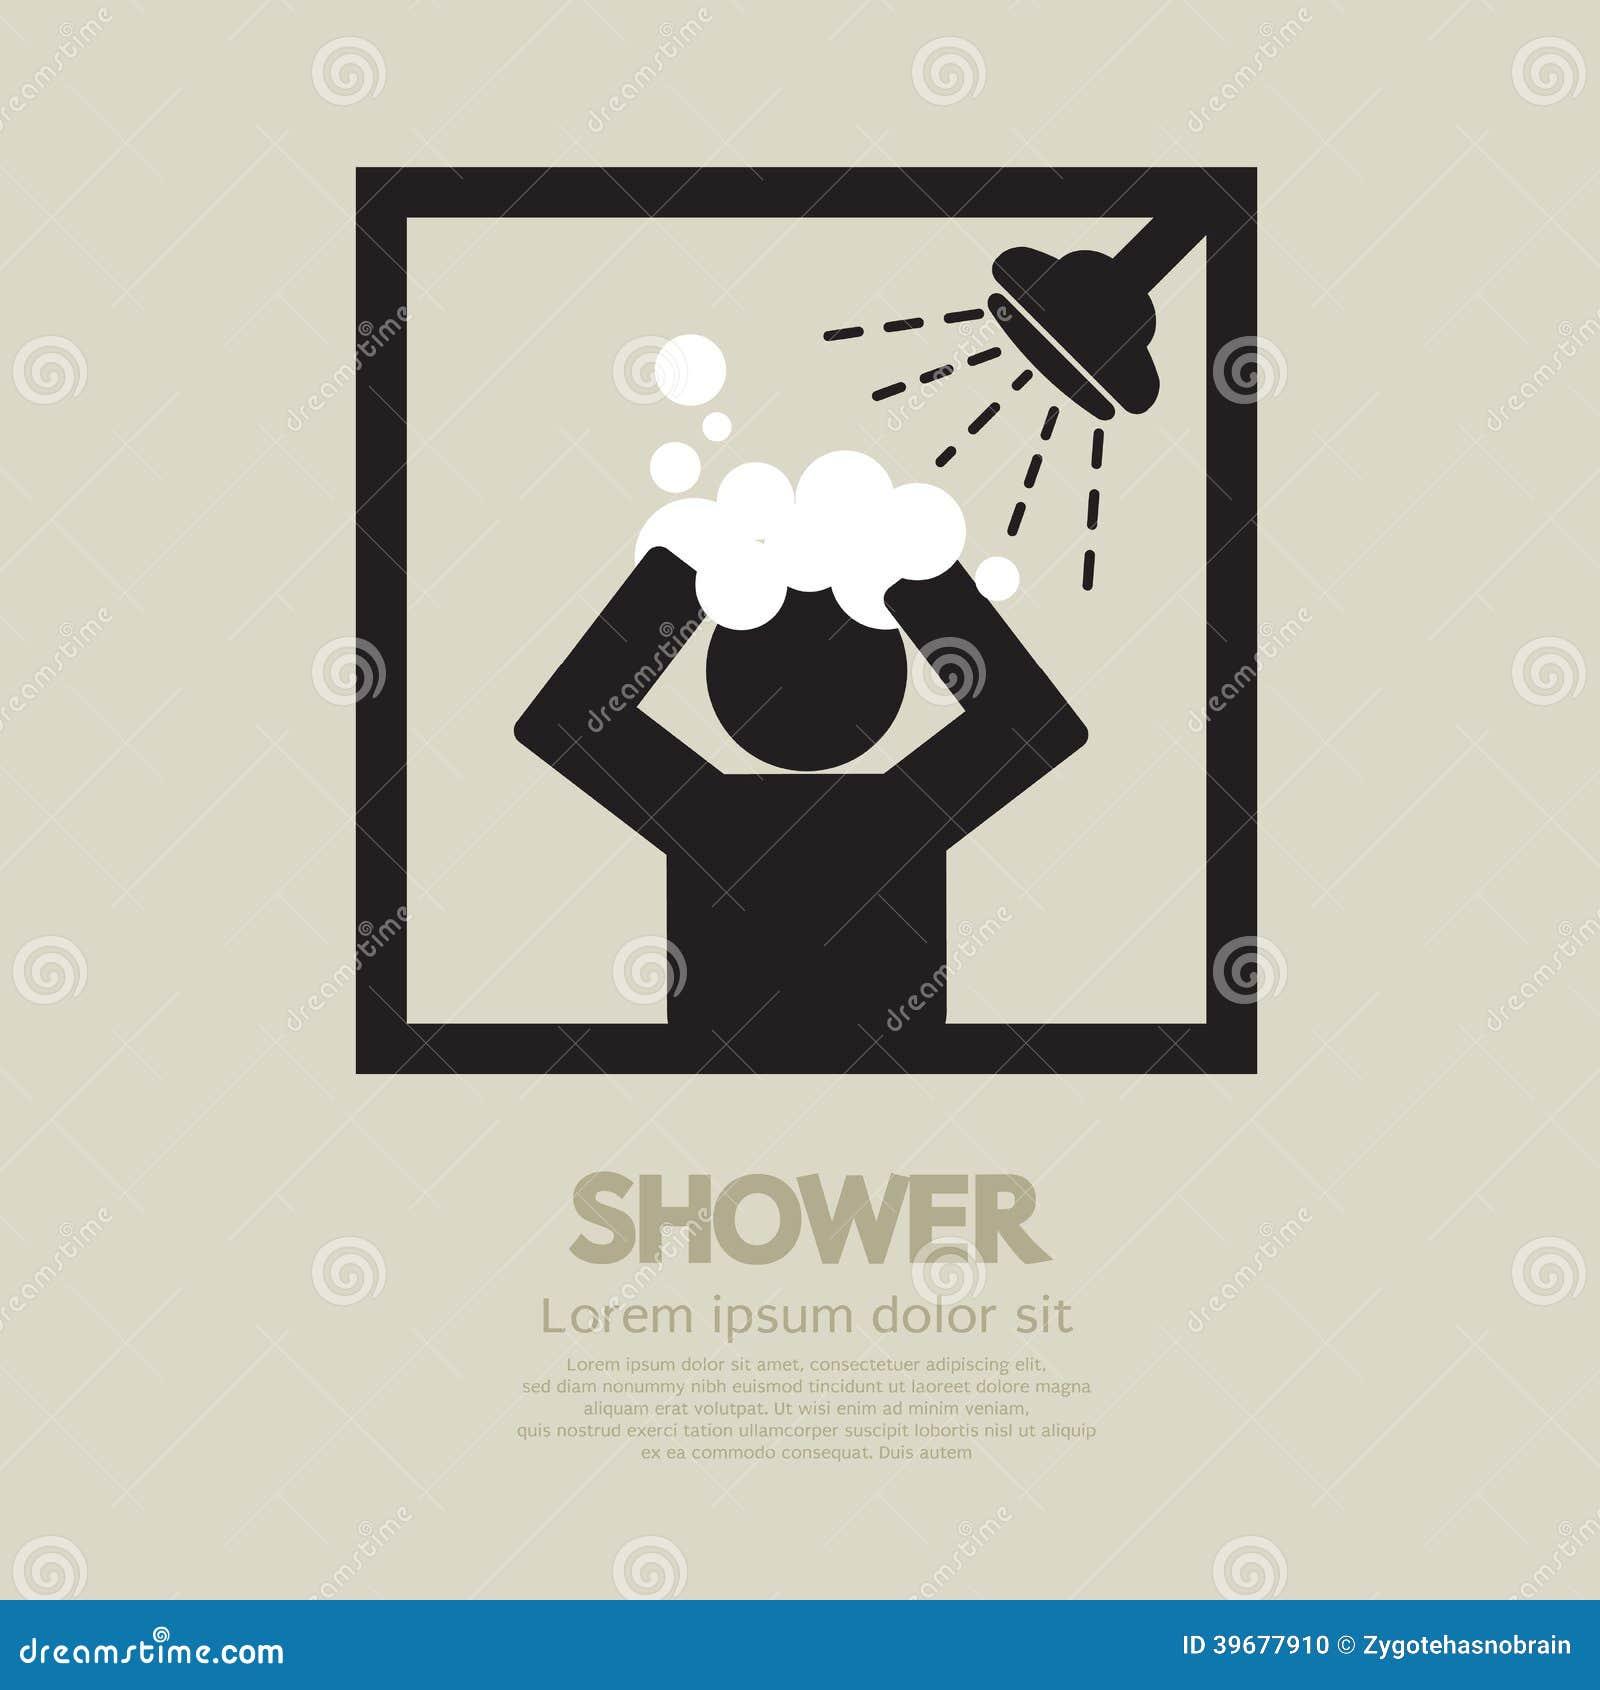 Shower Stock Vector Image 39677910